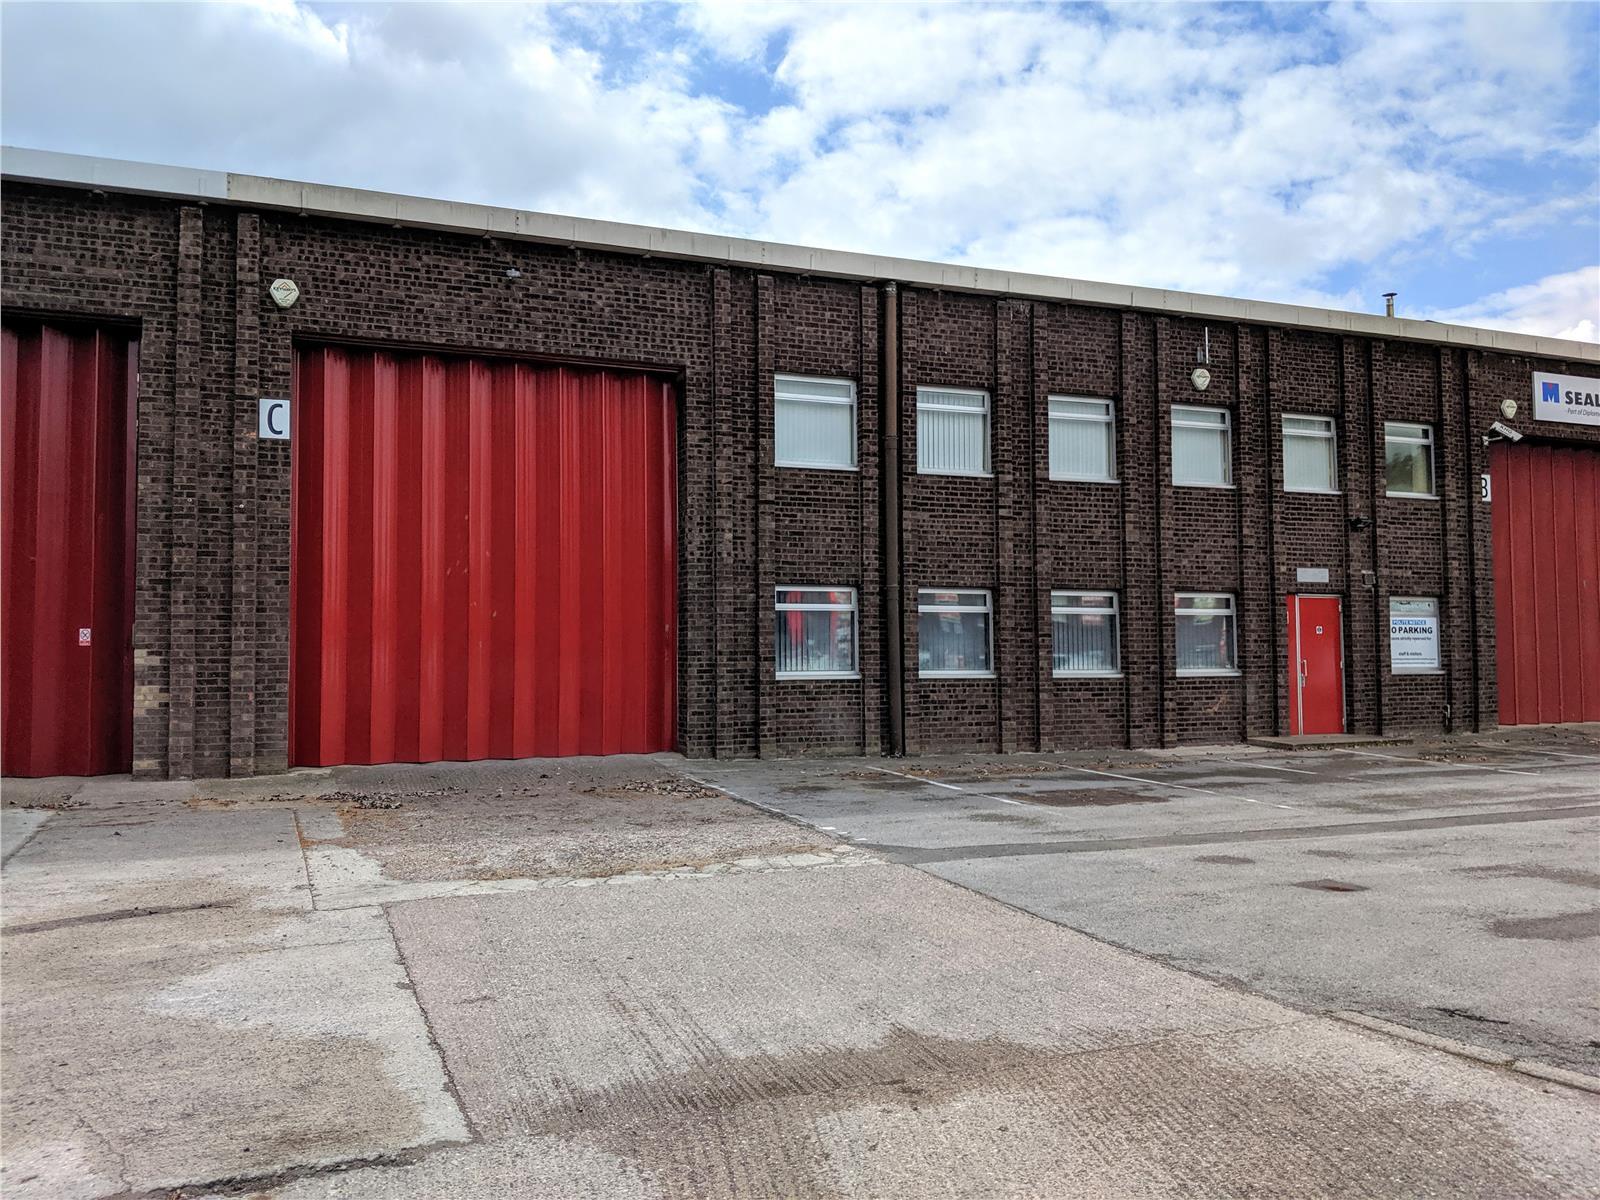 Unit C, Marlborough Close, Knutsford, Cheshire, WA16